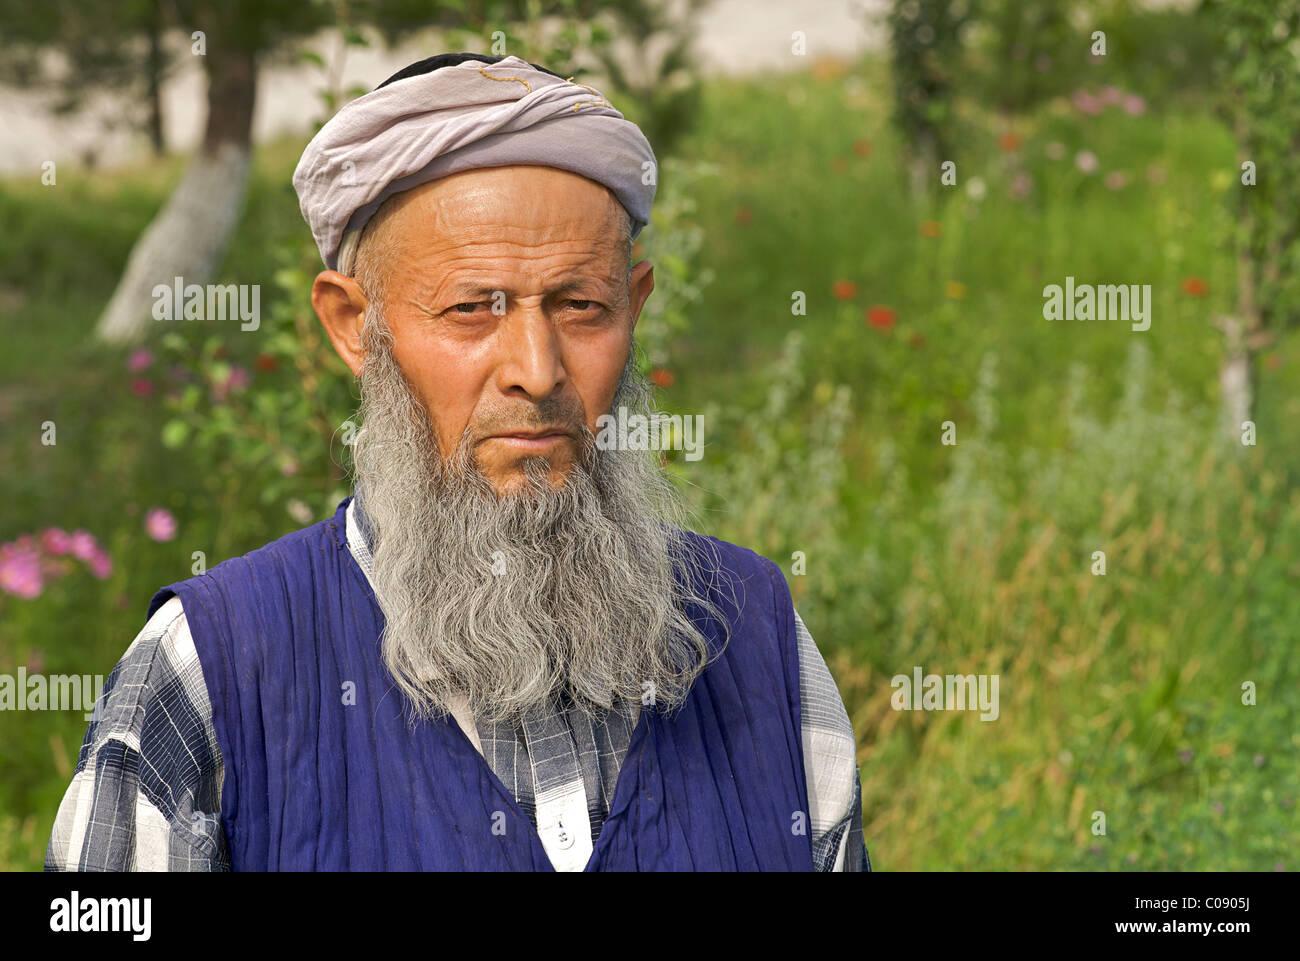 Muslim man wearing distinctive headcloth Bukhara, Uzbekistan - Stock Image